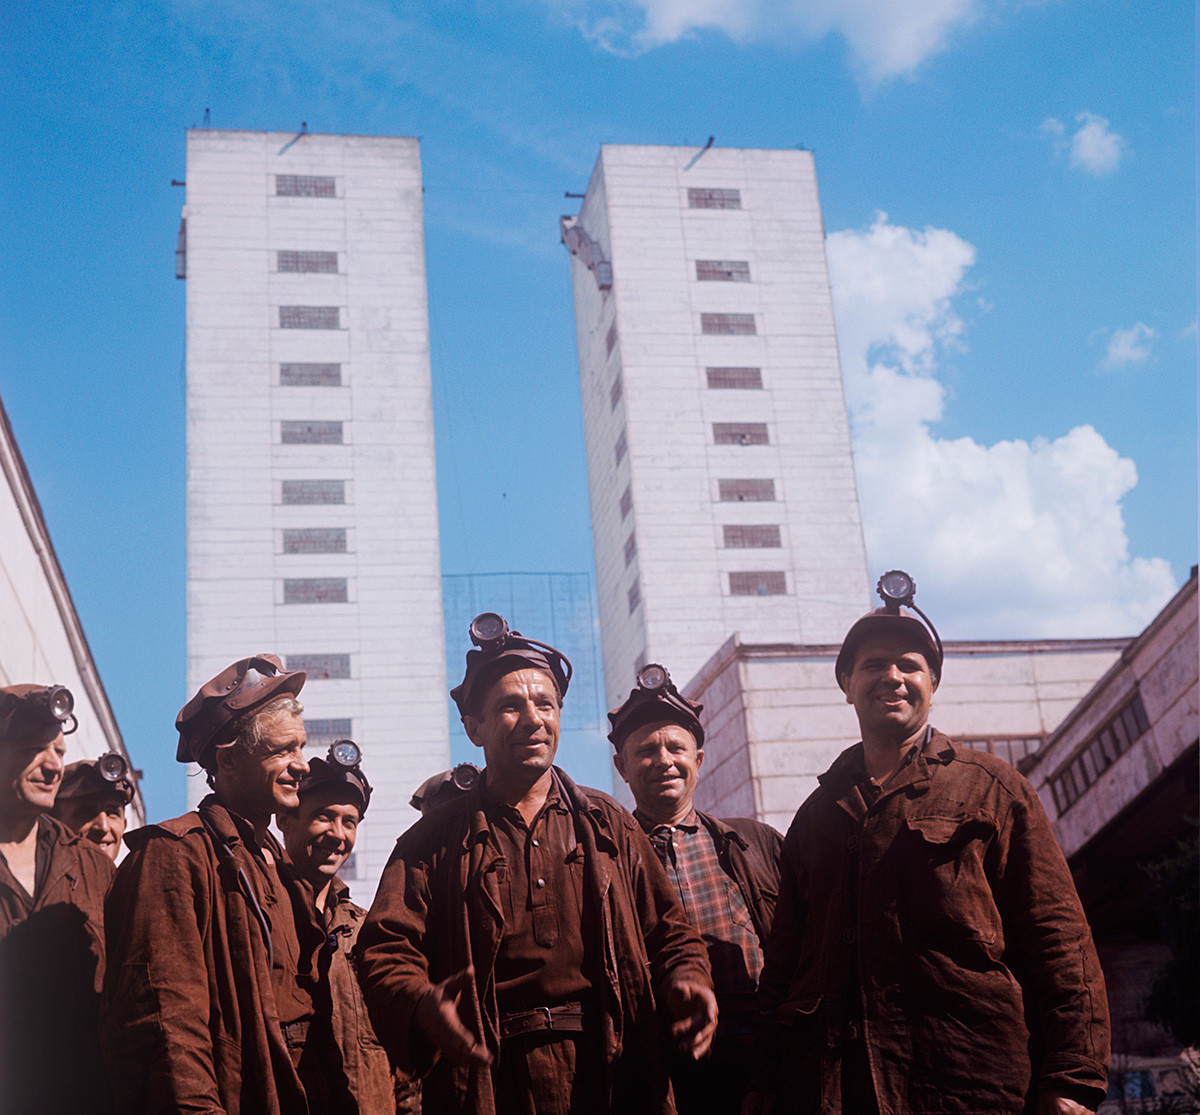 Miners at the Gvardeiskaya mine, Krivoy Rog, 1970